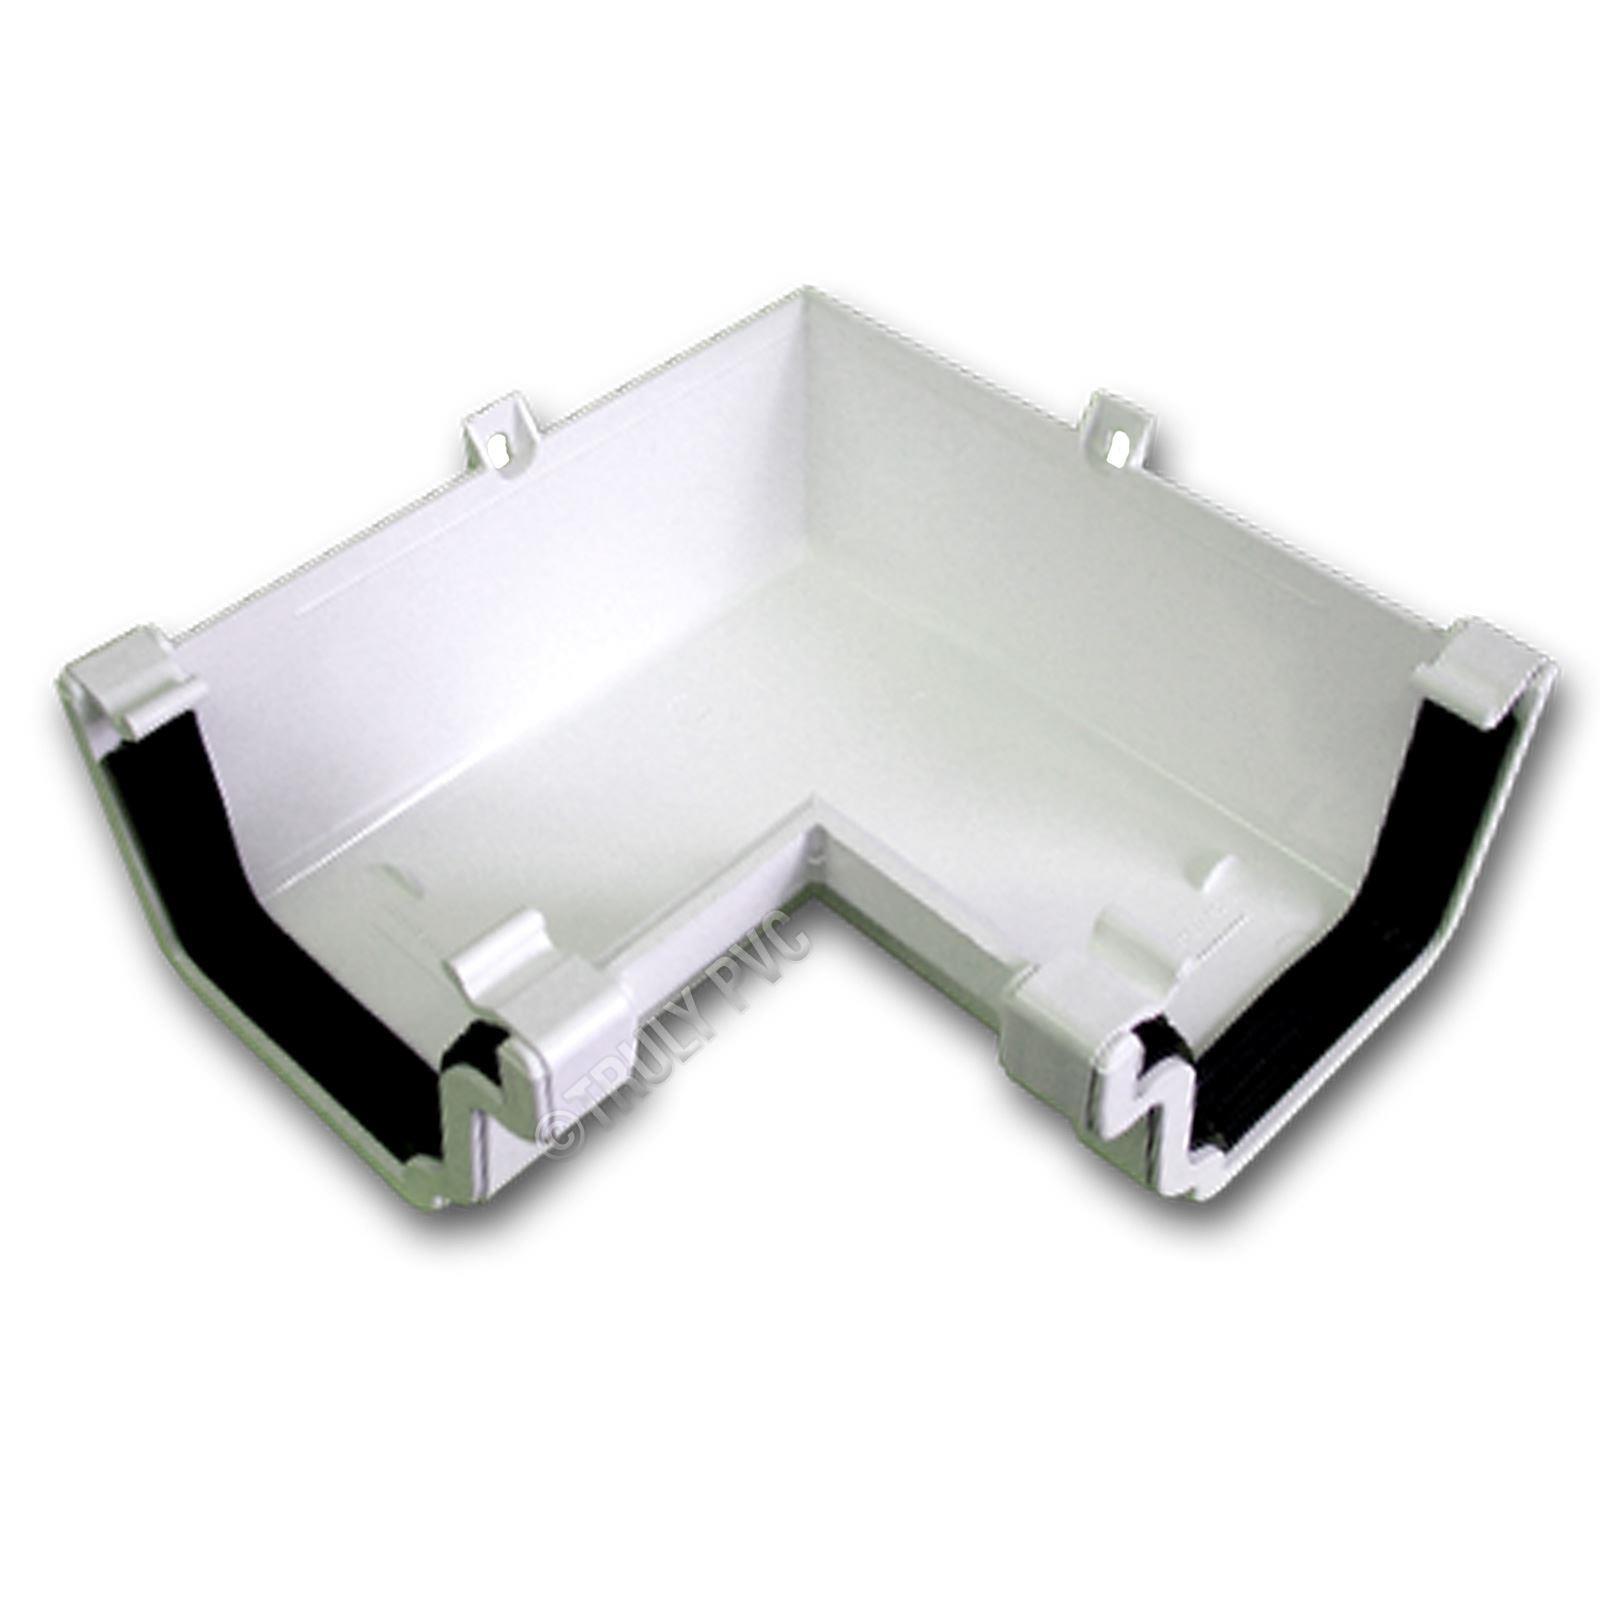 Marshall Tufflex Rwka3 90 176 Internal Gutter Corner Joint